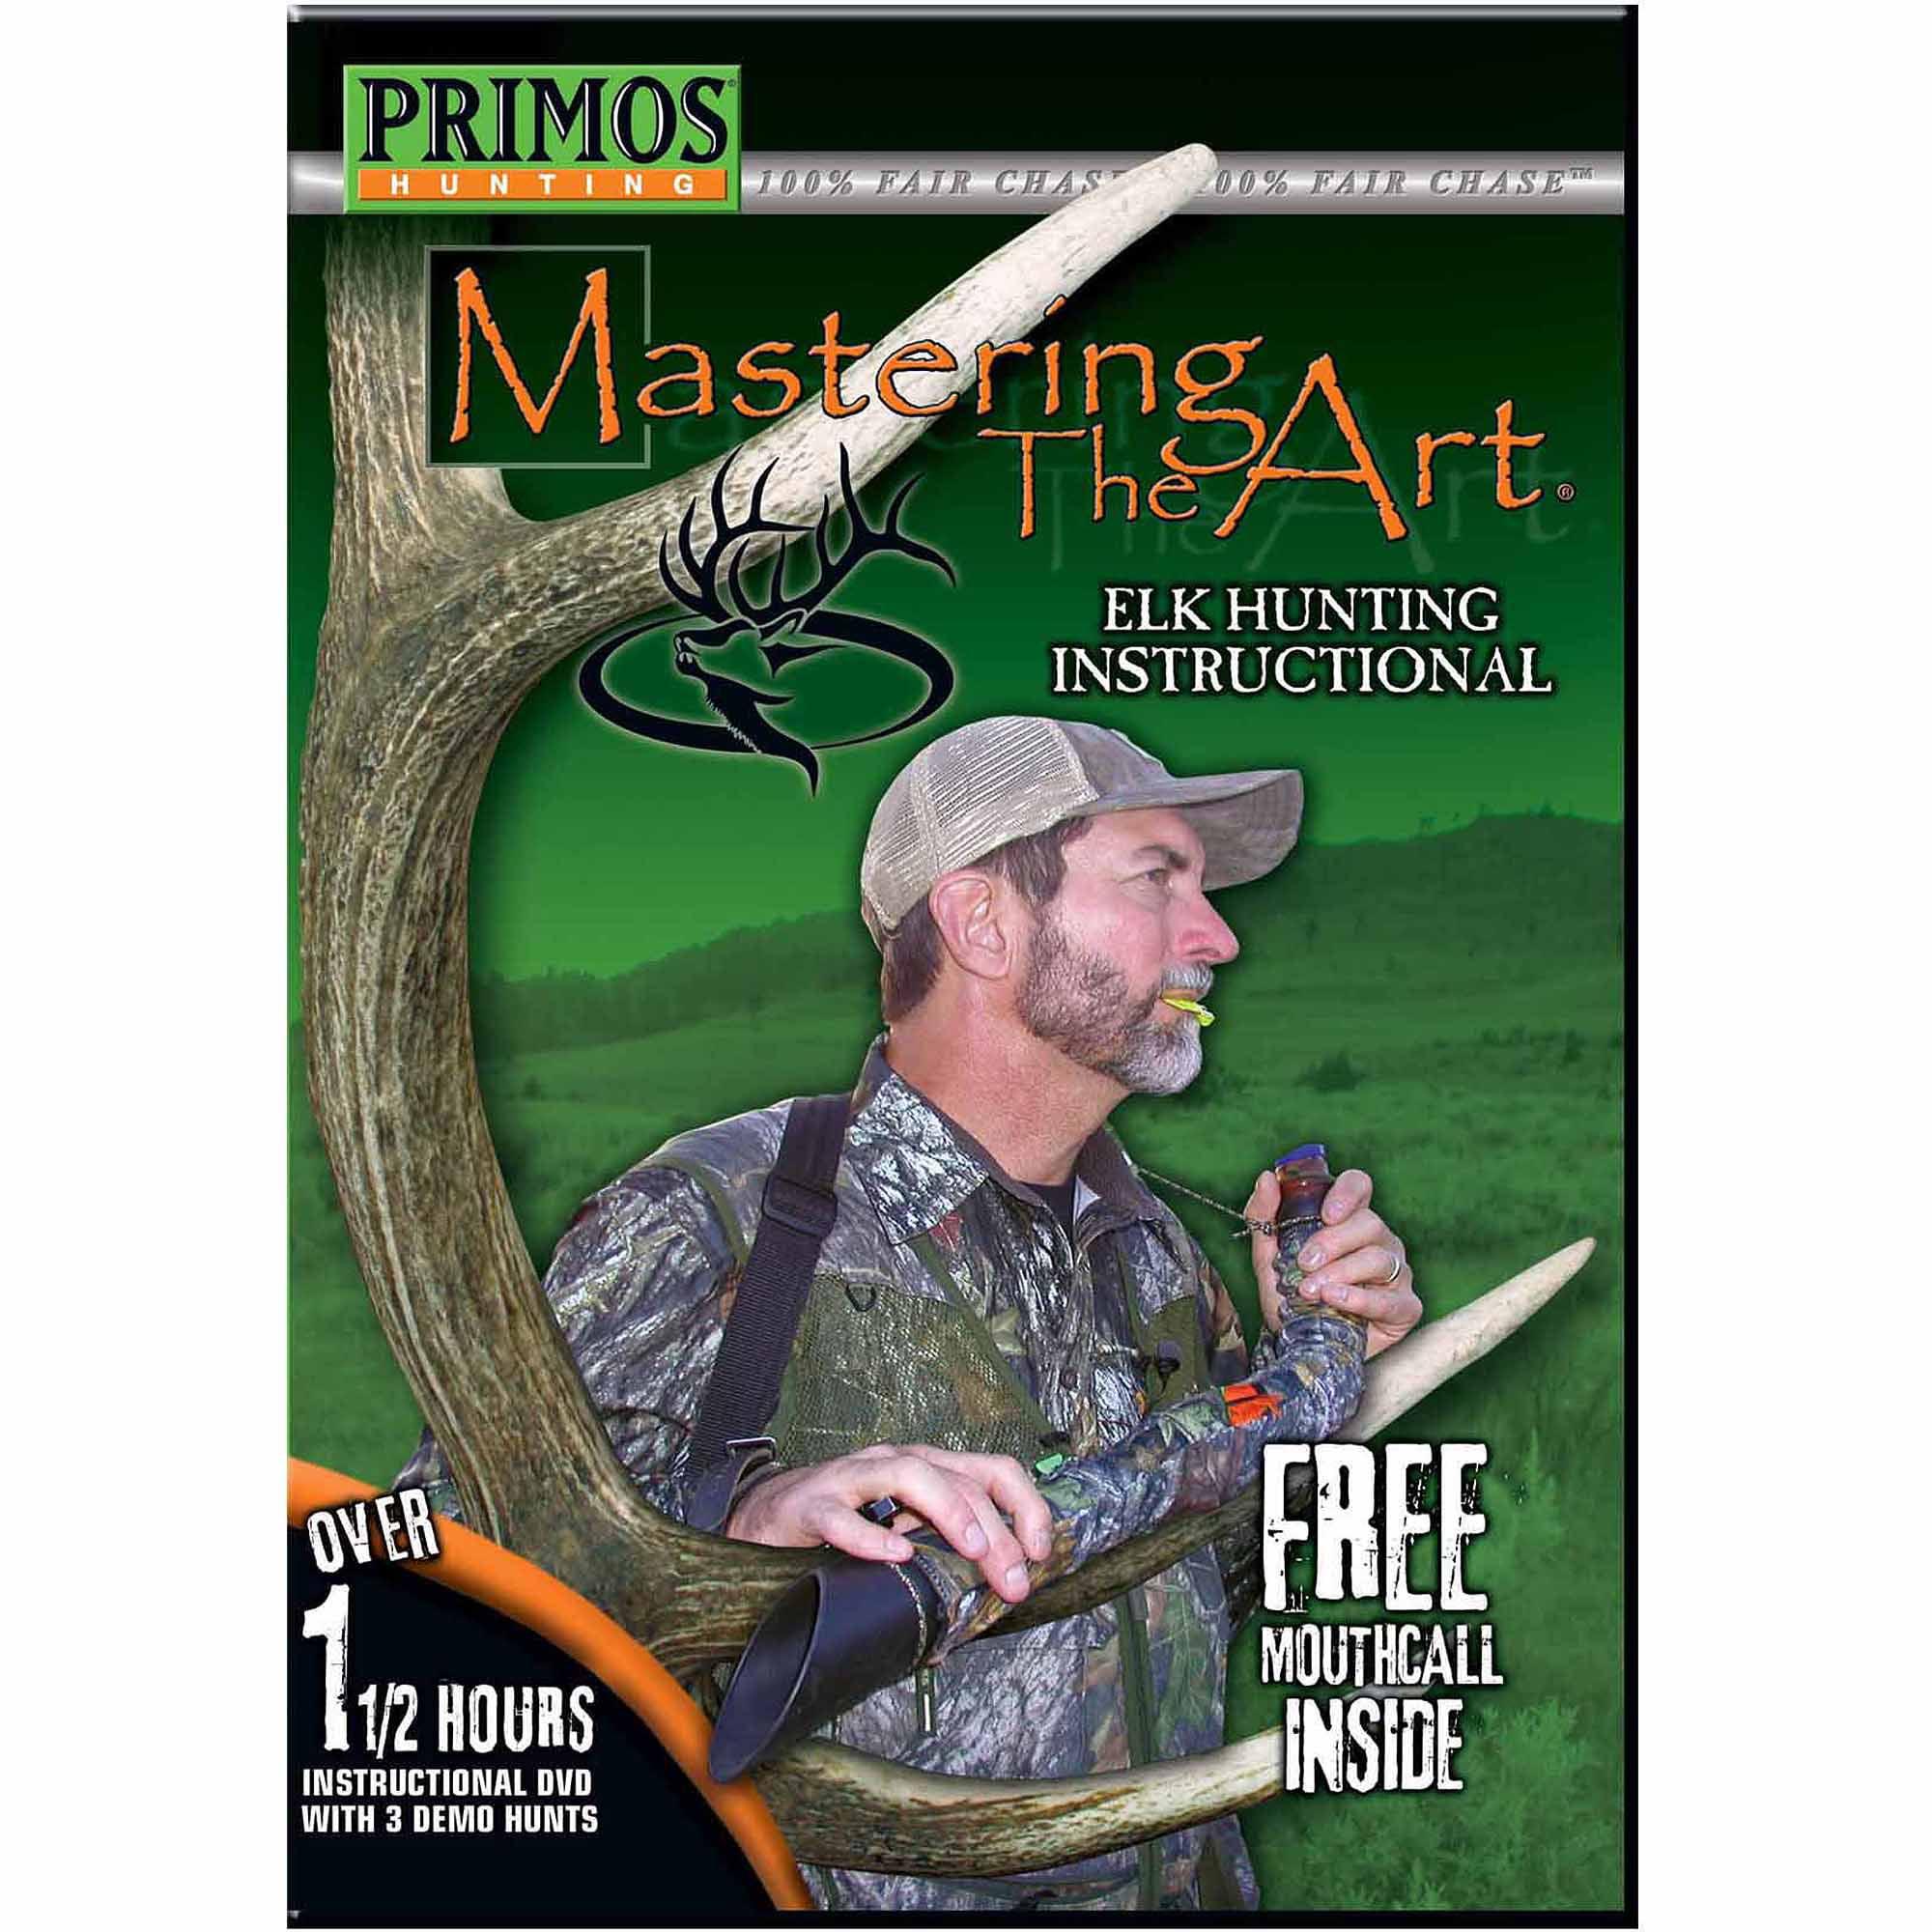 Primos Mastering the Art DVD, Elk